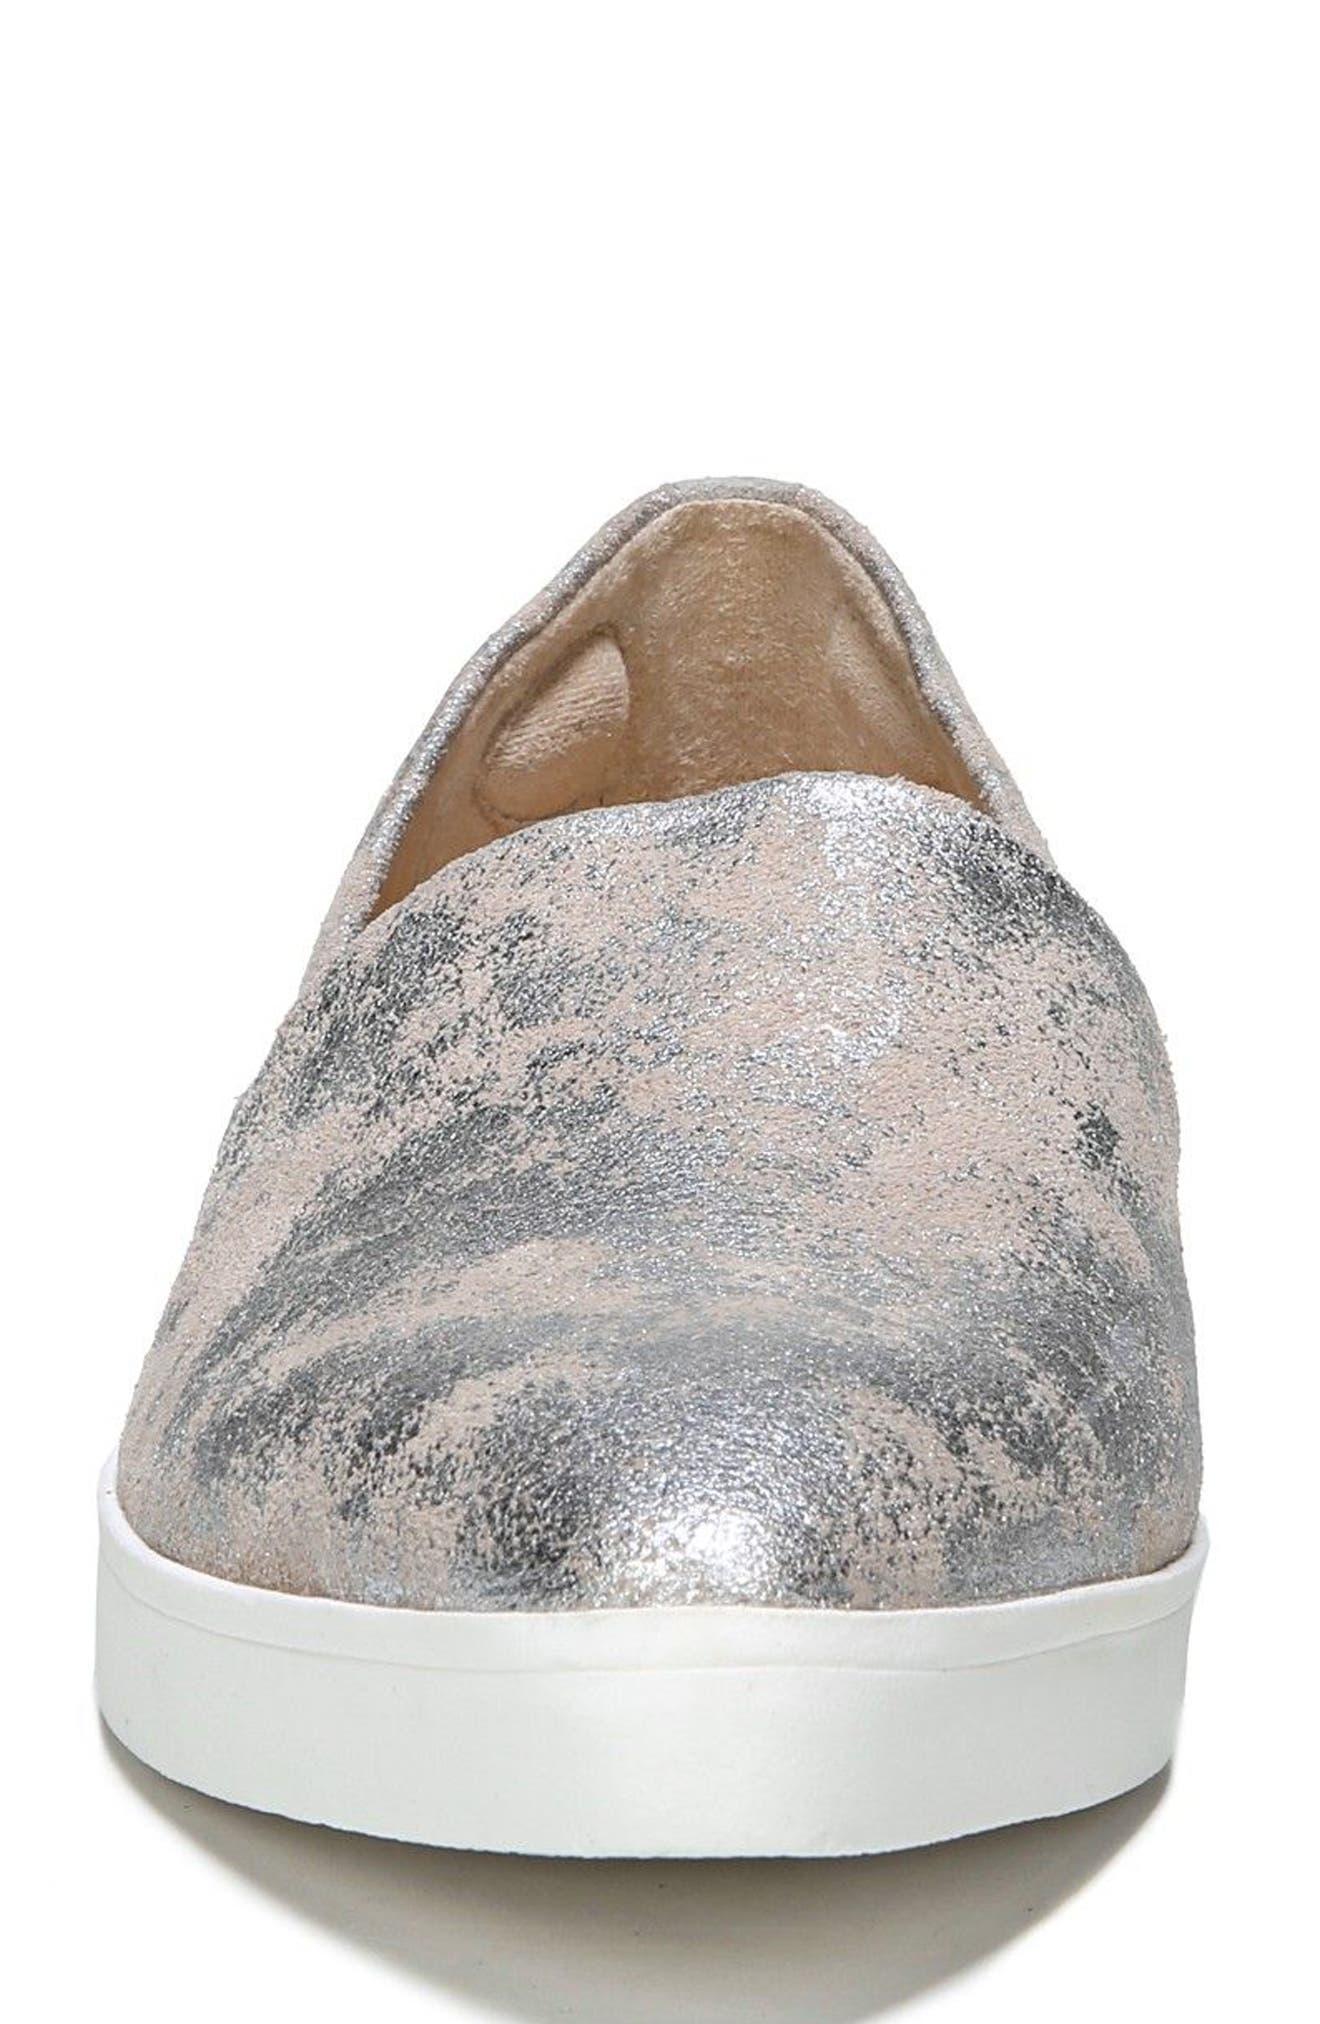 'Vienna' Slip-on Sneaker,                             Alternate thumbnail 4, color,                             040